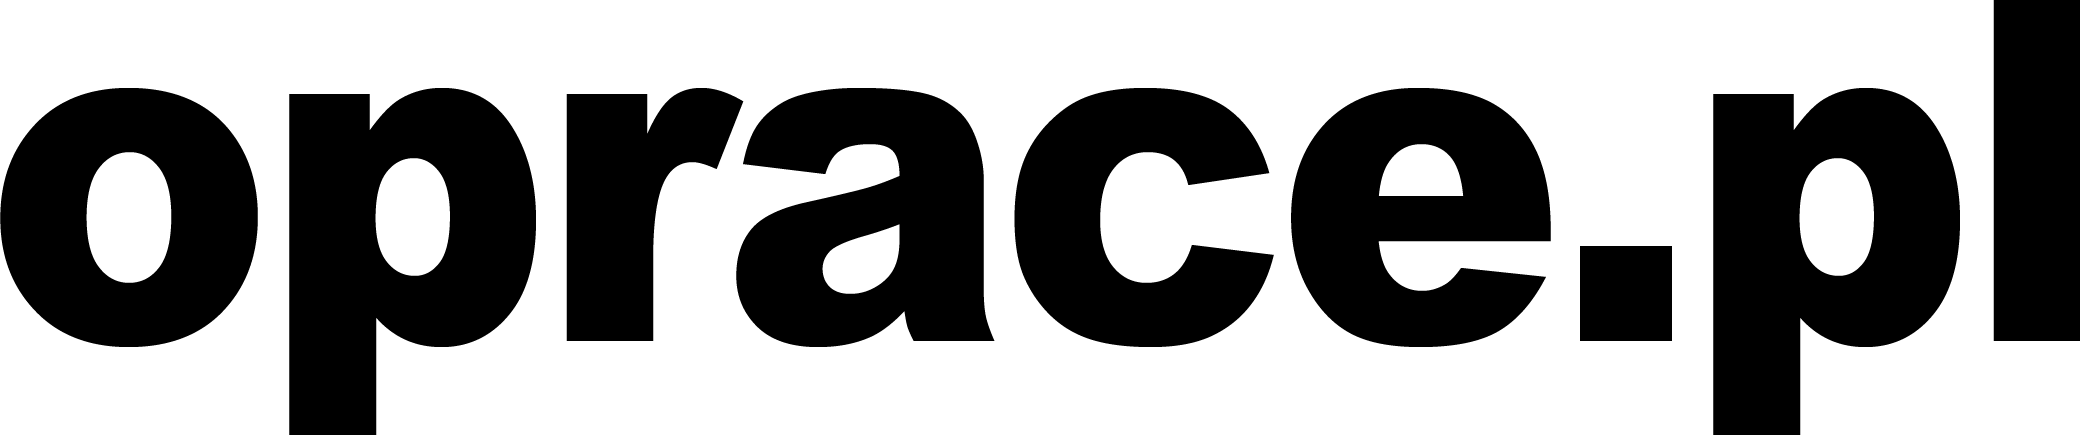 Ogłoszenia Bielsko-Biała